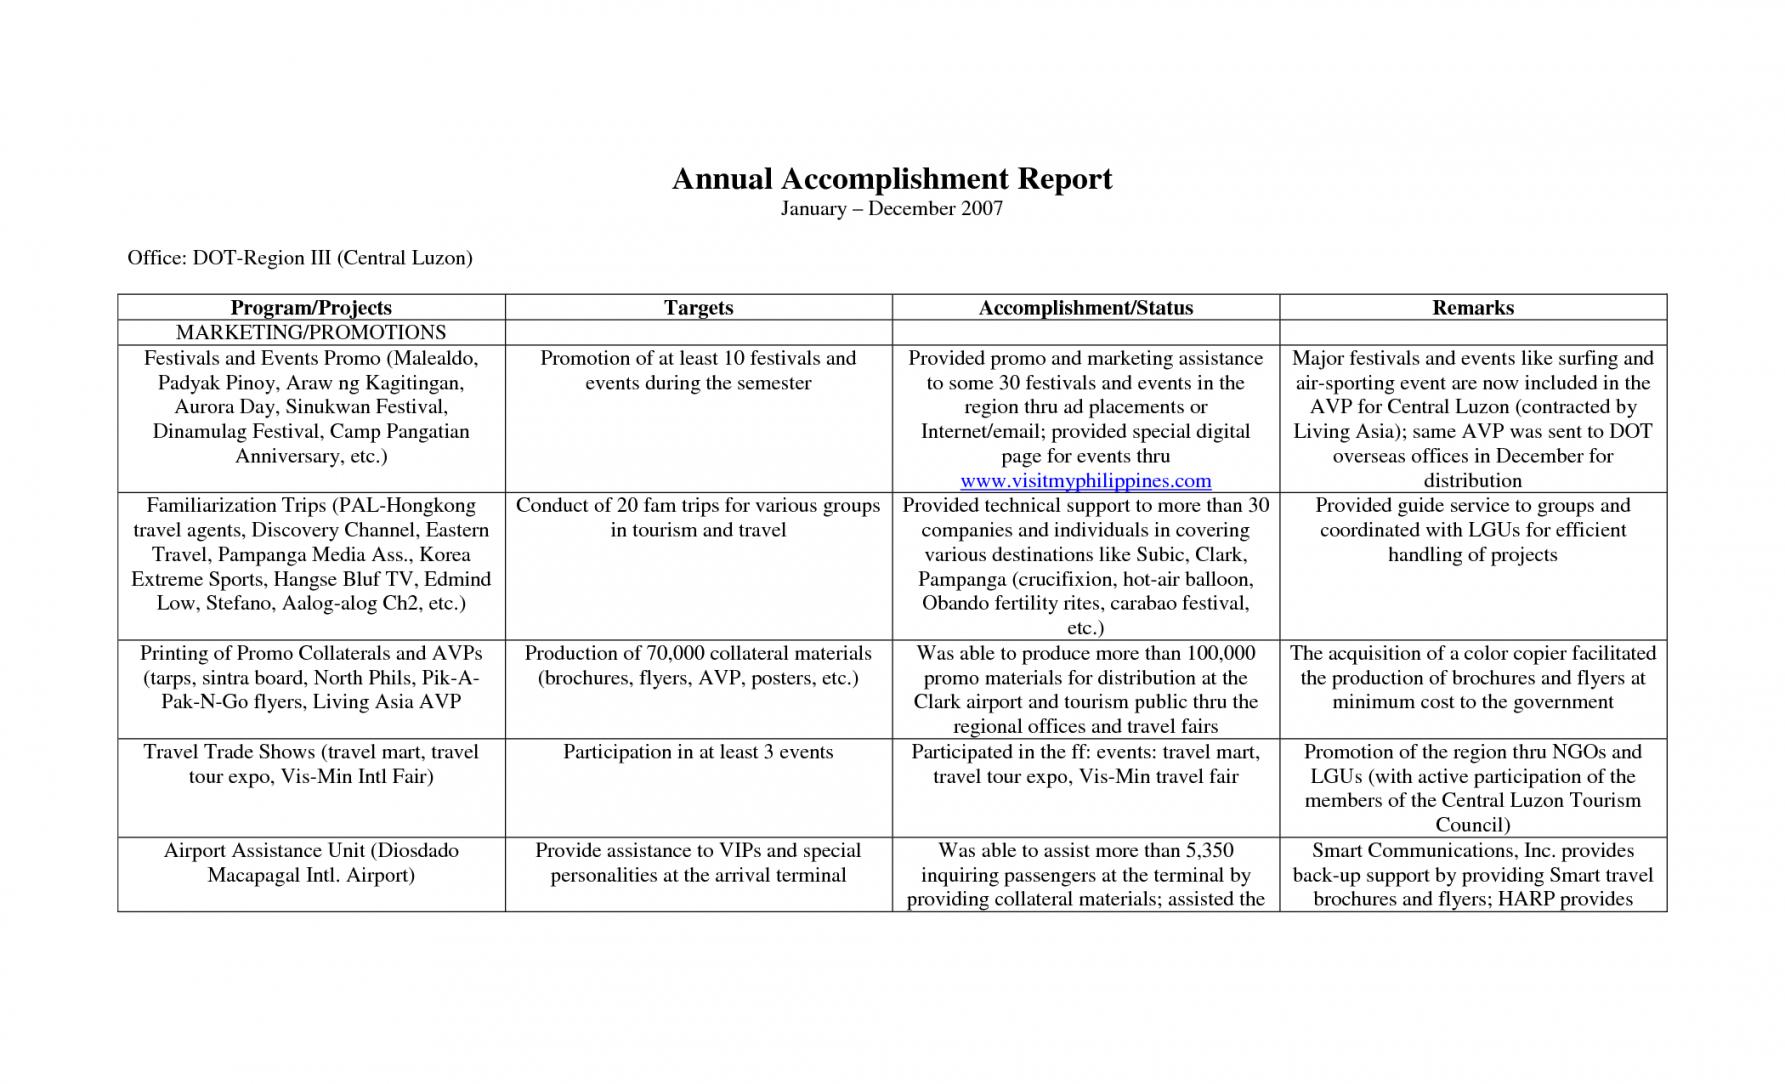 Accomplishment Report  zanderm.com Regarding Weekly Accomplishment Report Template